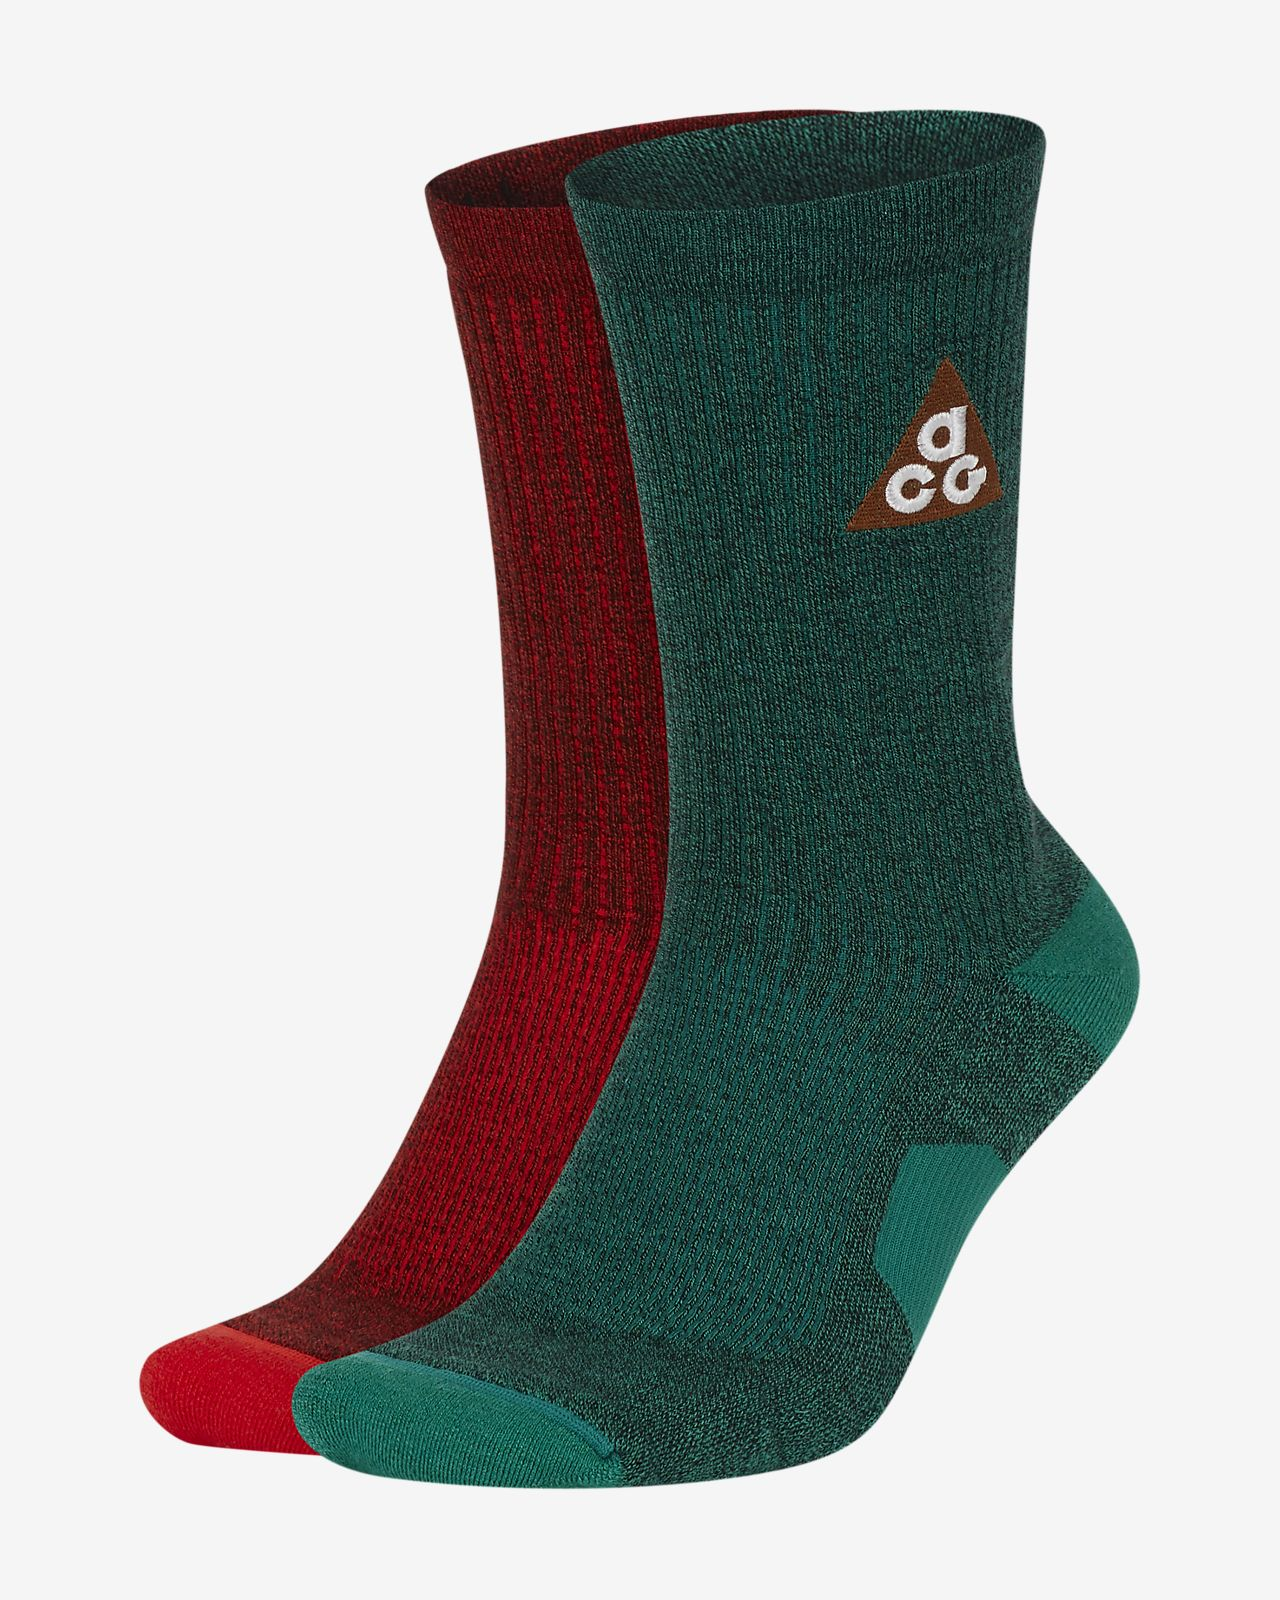 Nike ACG 365 Crew Socks (2 Pairs)